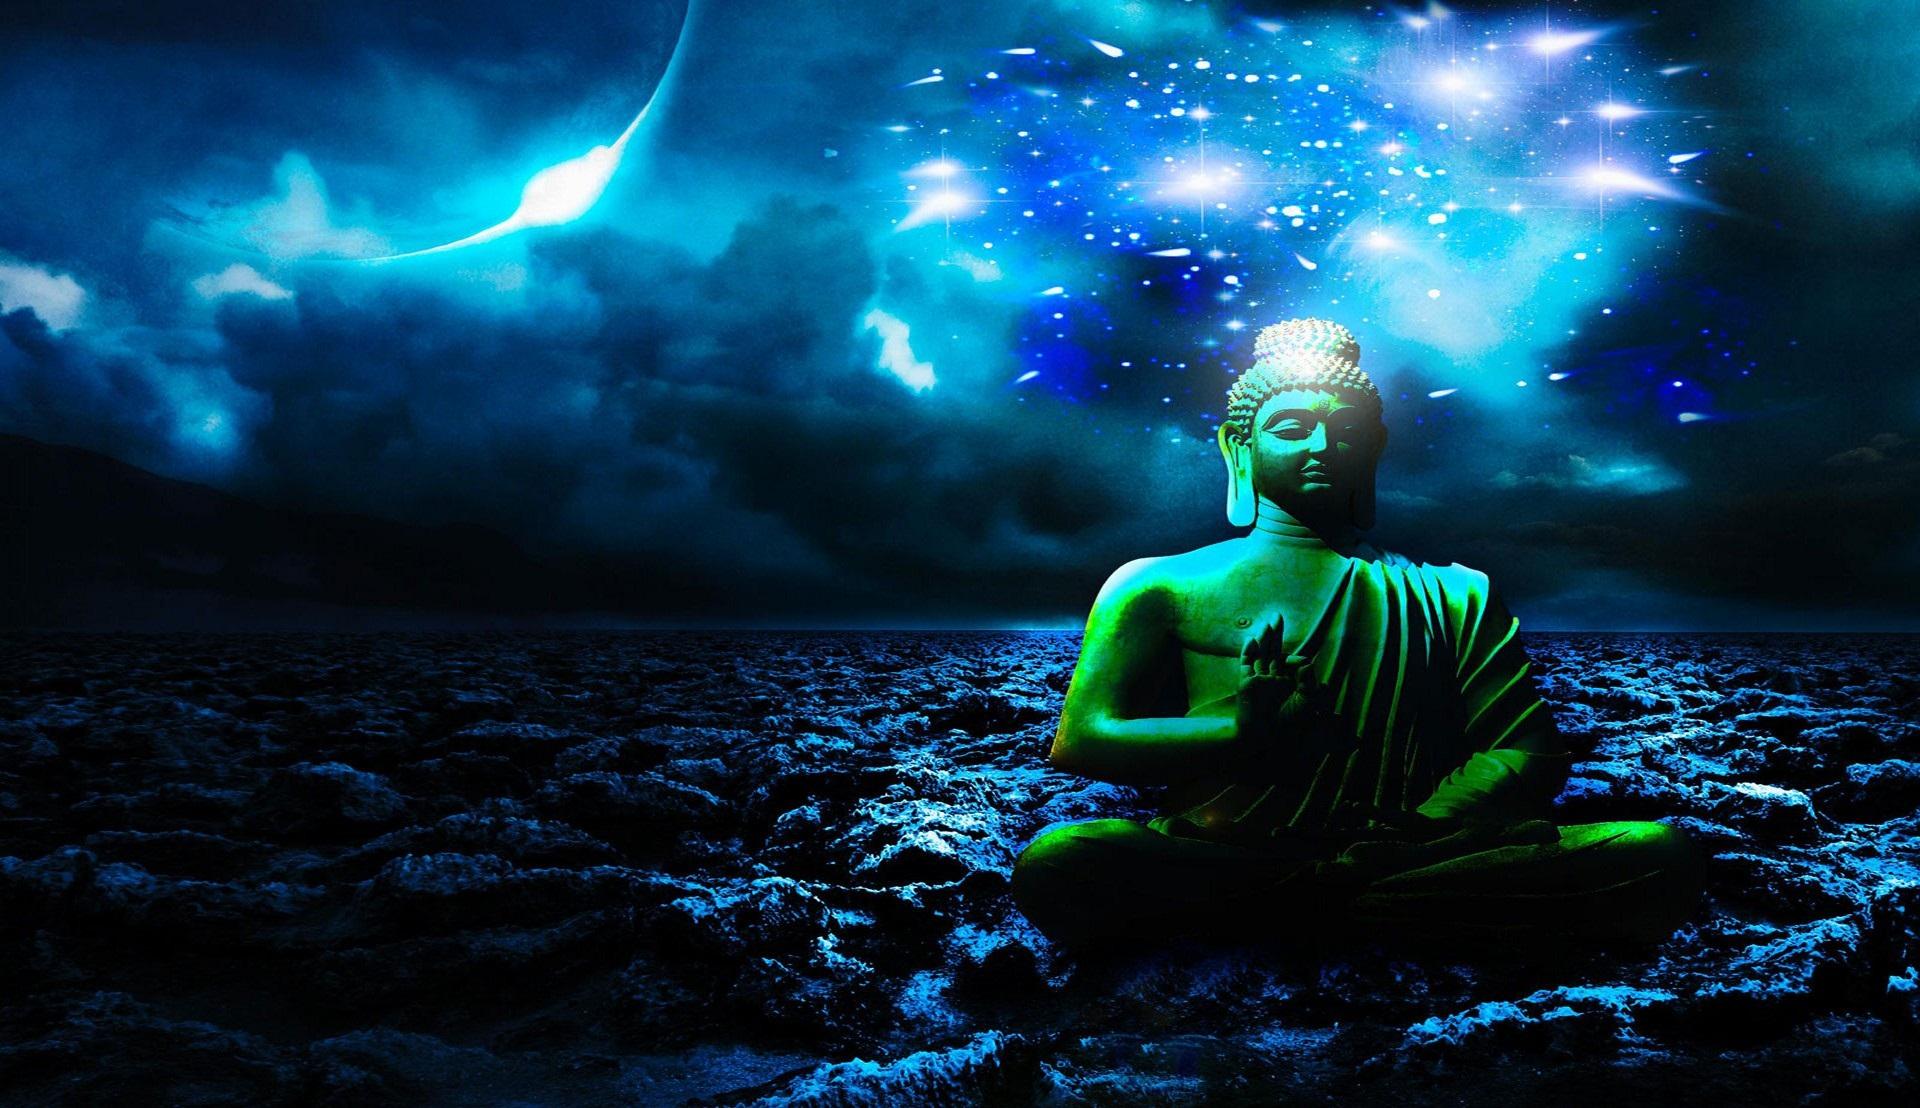 Meditation Wallpaper Free - WallpaperSafari